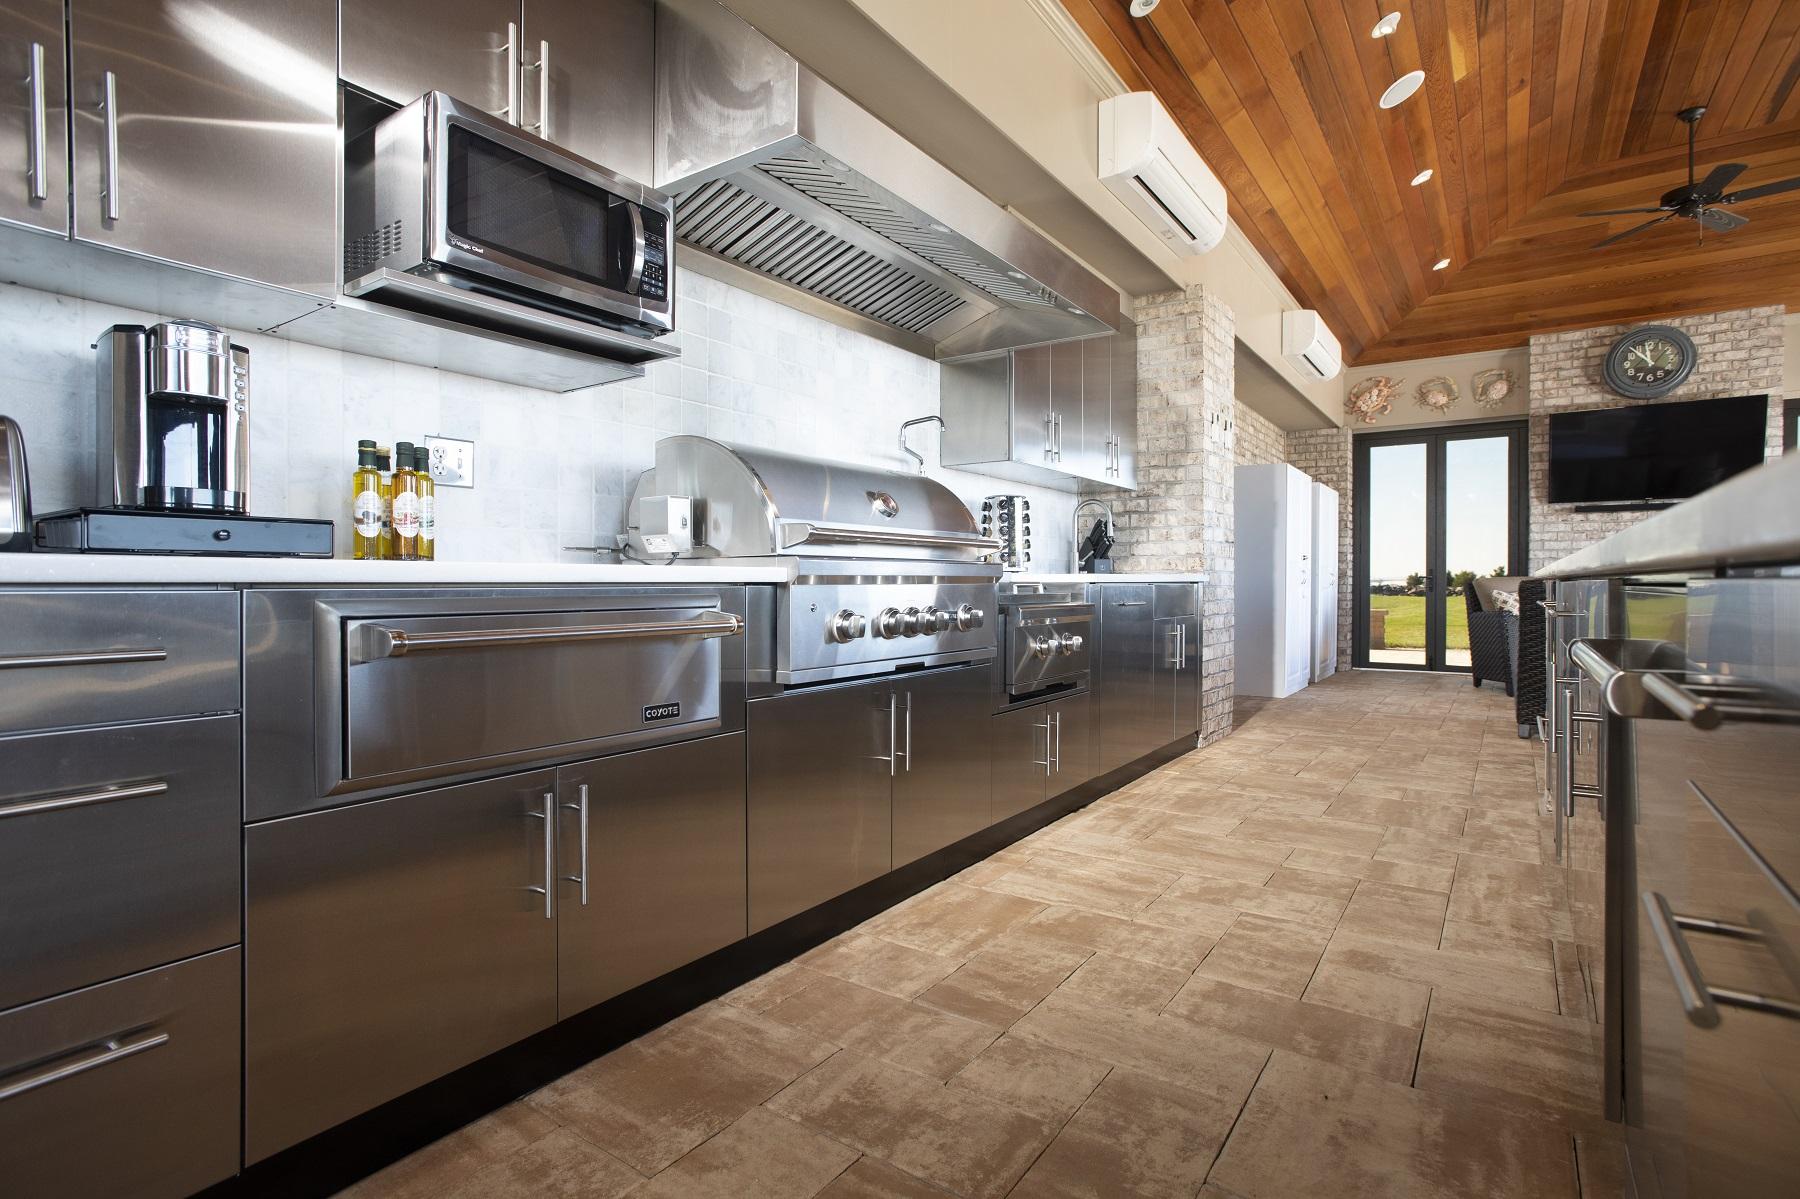 Danver Cabinets Indoor Poolhouse Kitchen Installation